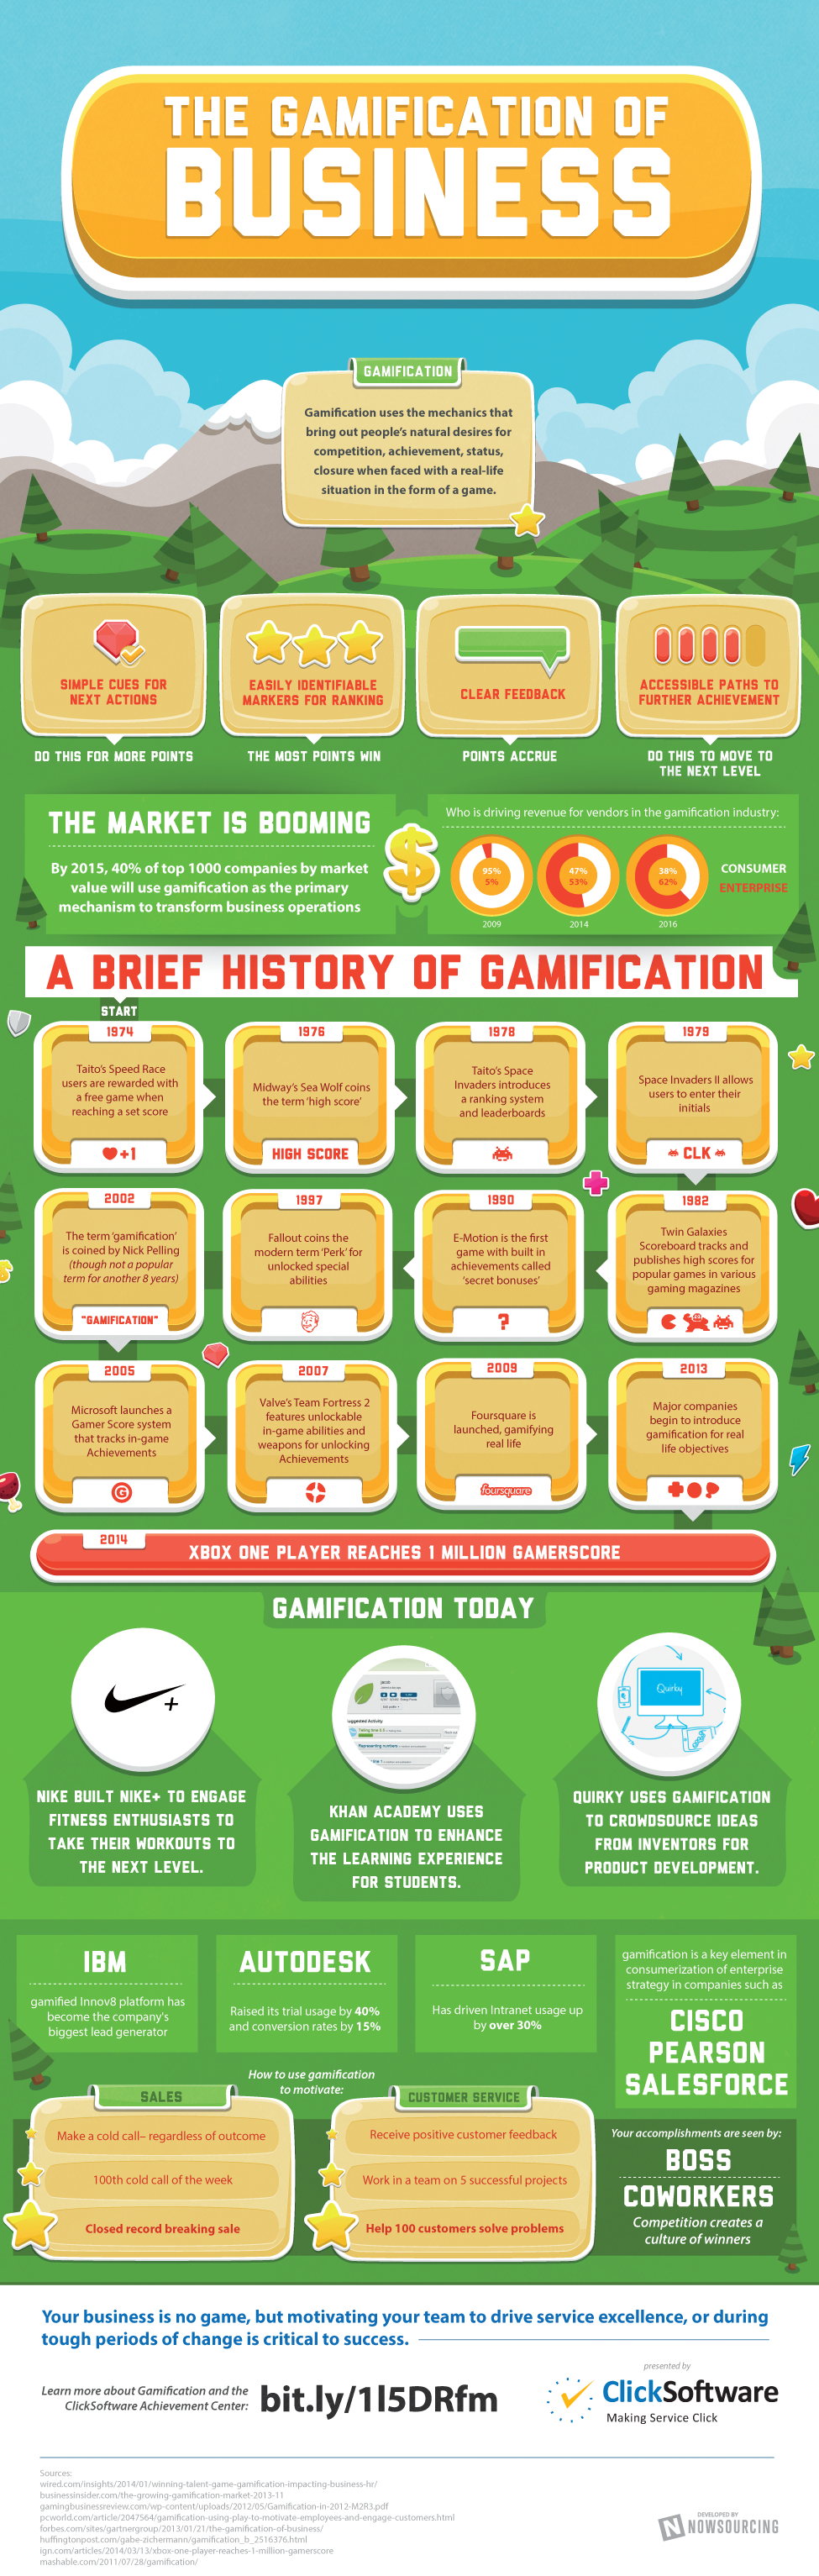 Gamfication-history